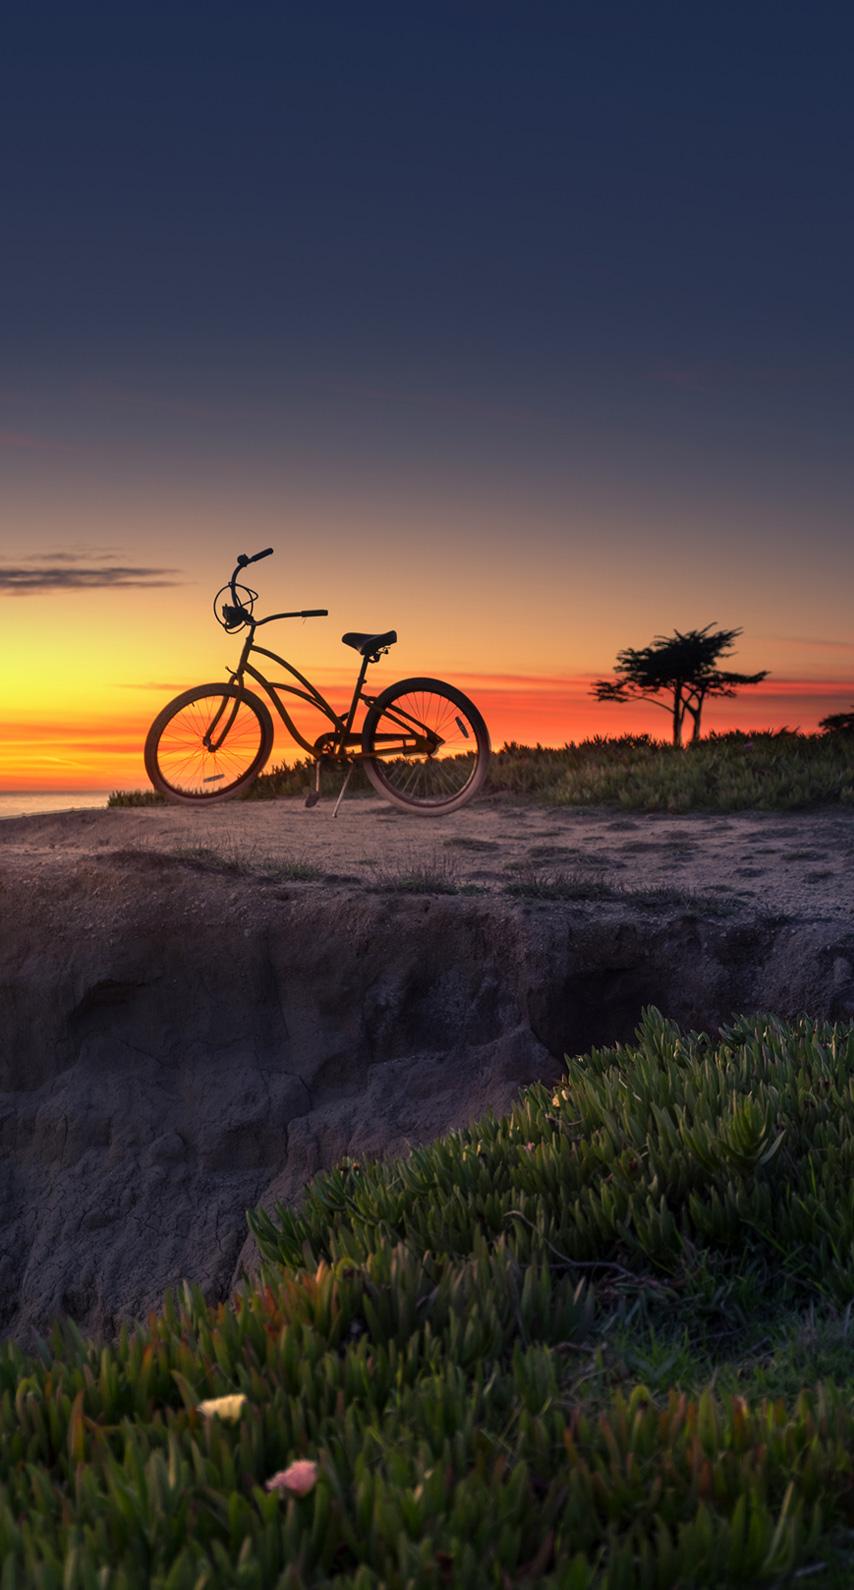 bike, life